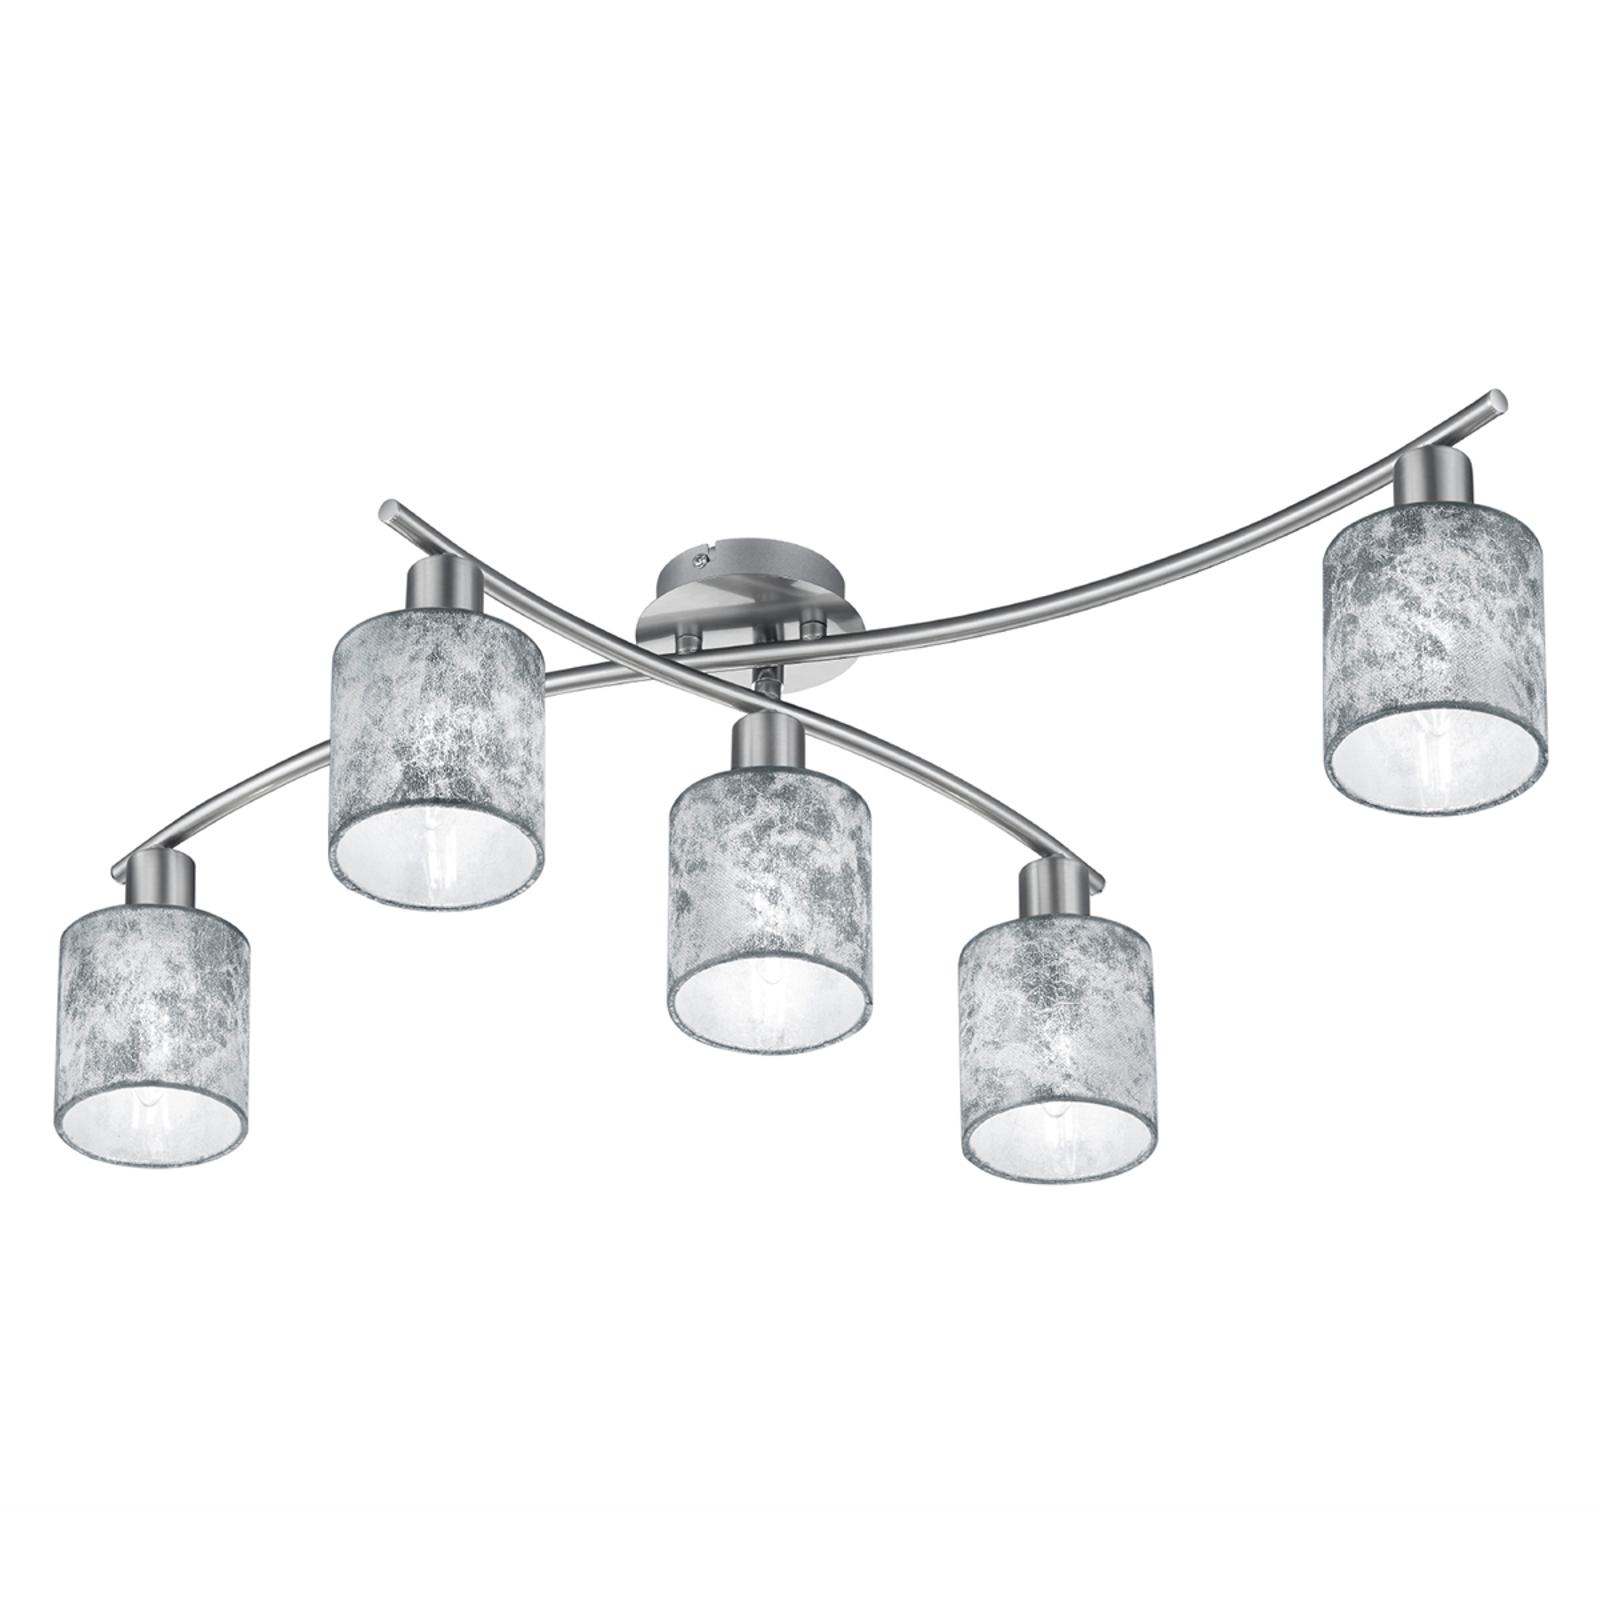 Garda – 5-punktowa lampa sufitowa, srebrne klosze